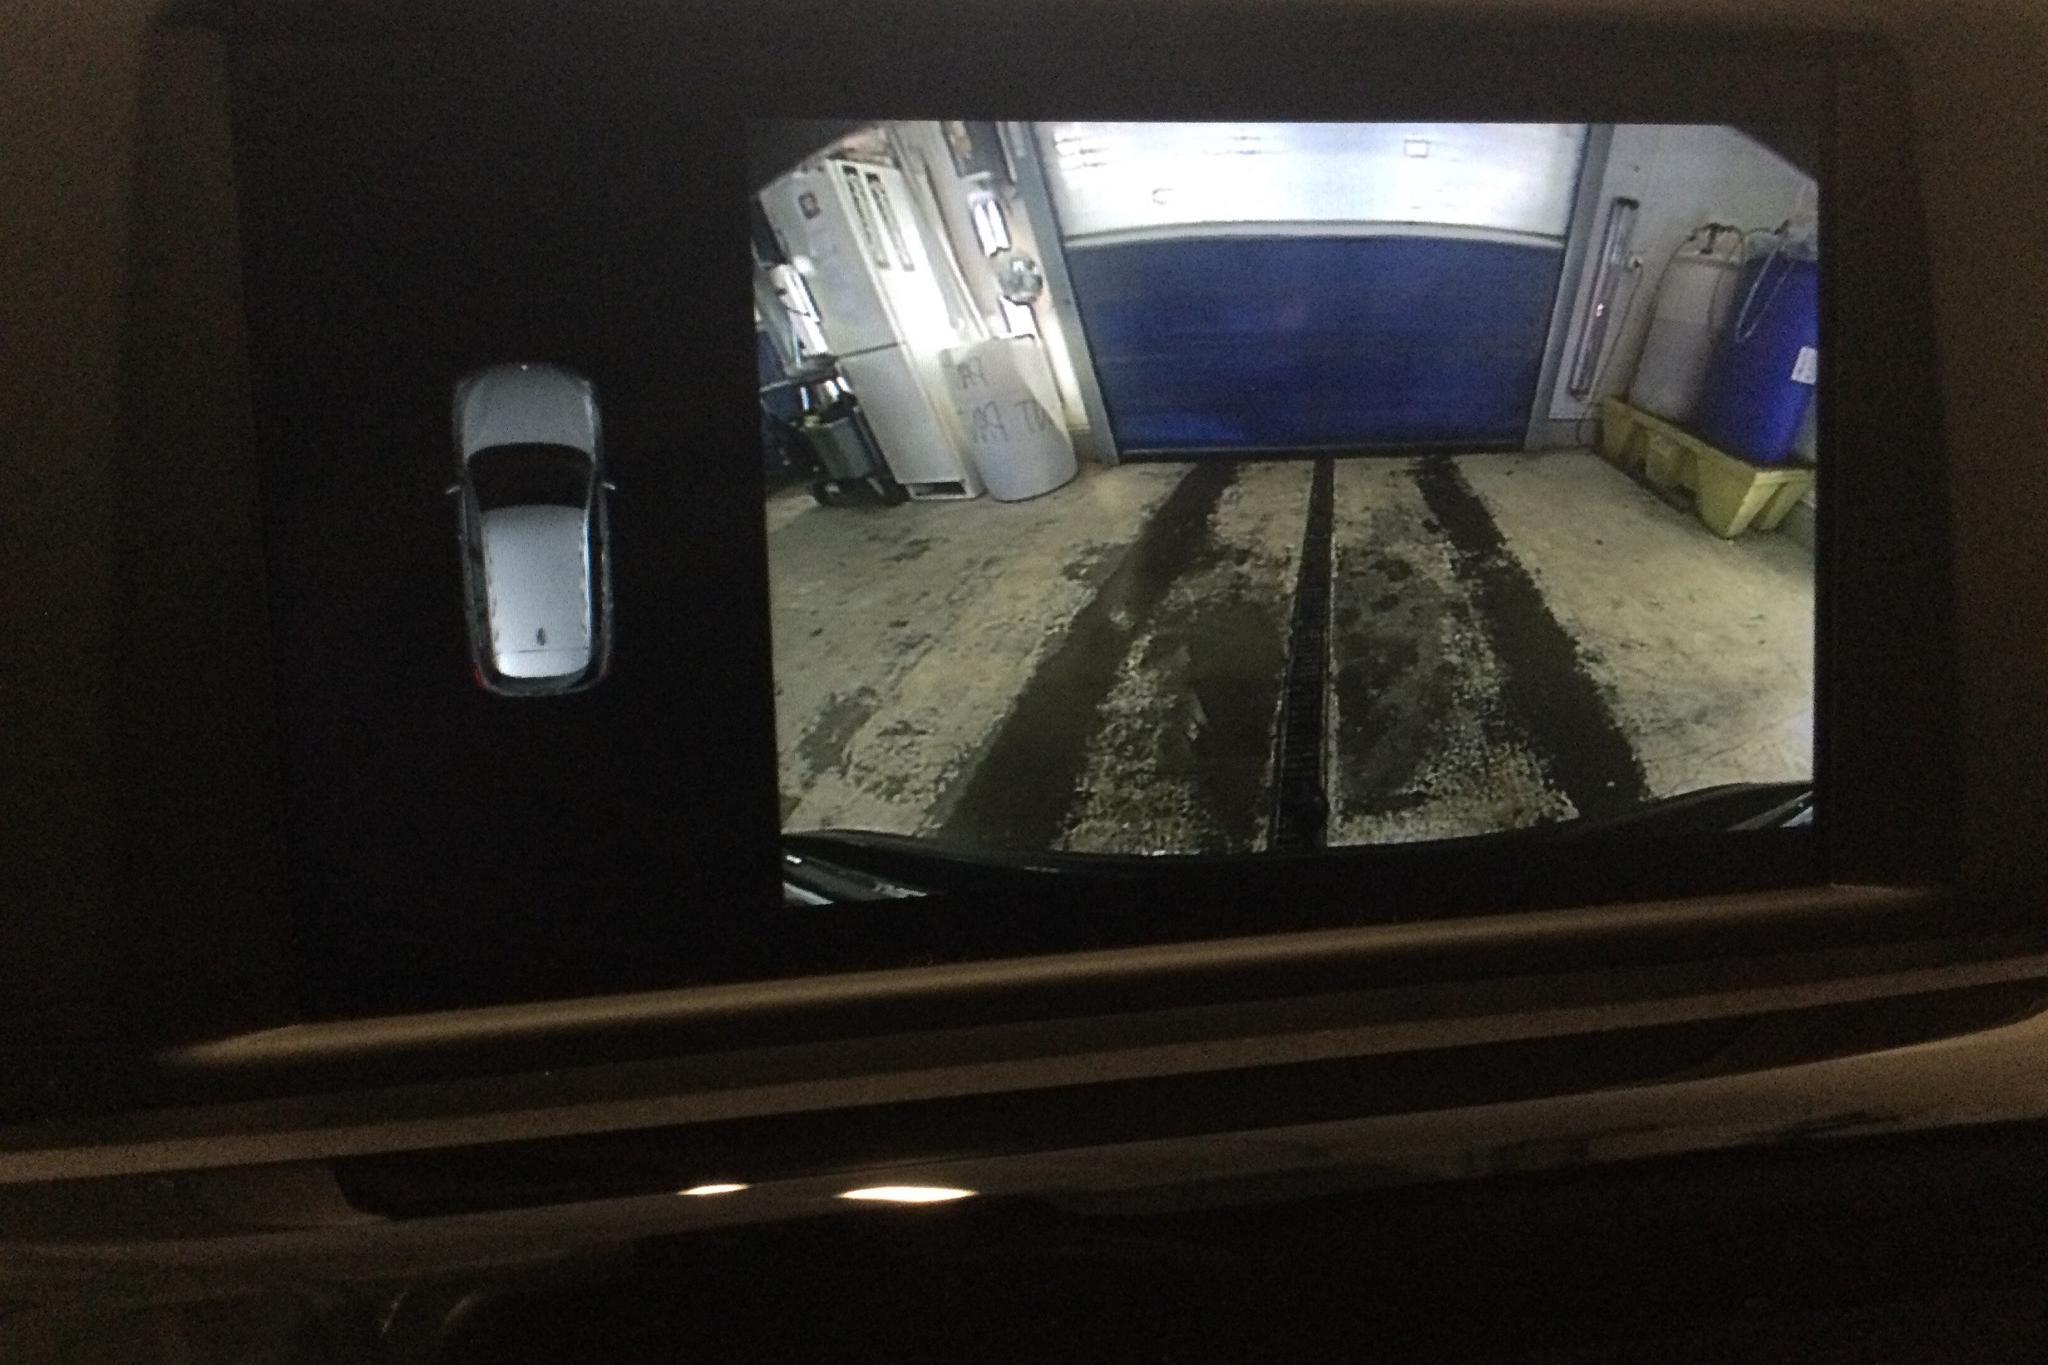 BMW X1 xDrive18d, F48 (150hk) - 71 680 km - Manual - black - 2018